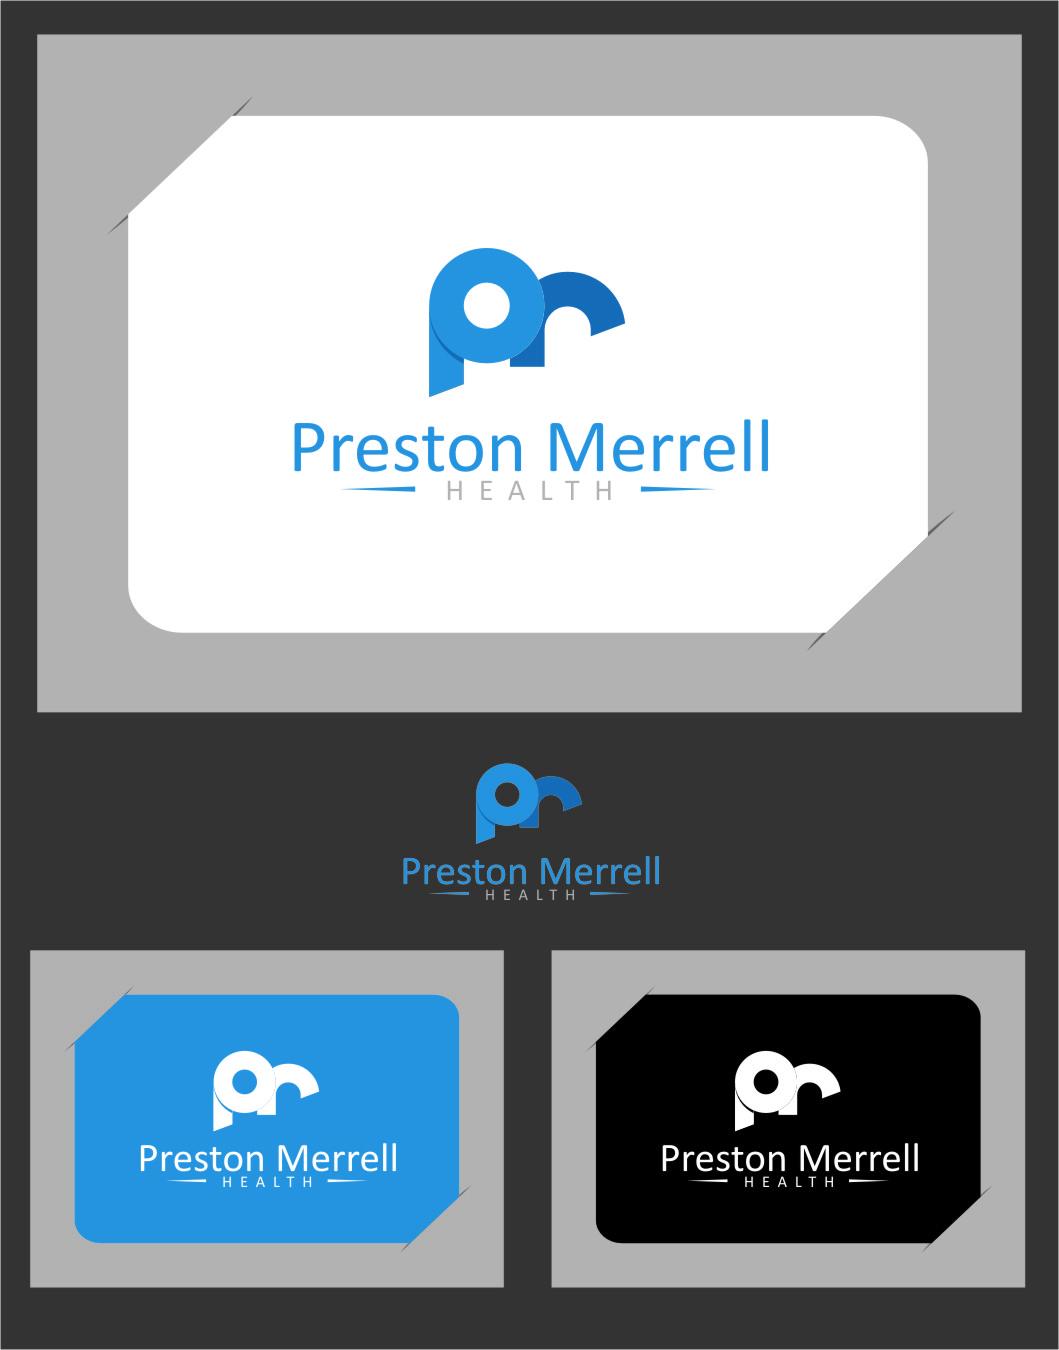 Logo Design by Ngepet_art - Entry No. 213 in the Logo Design Contest Creative Logo Design for Preston Merrell Health.